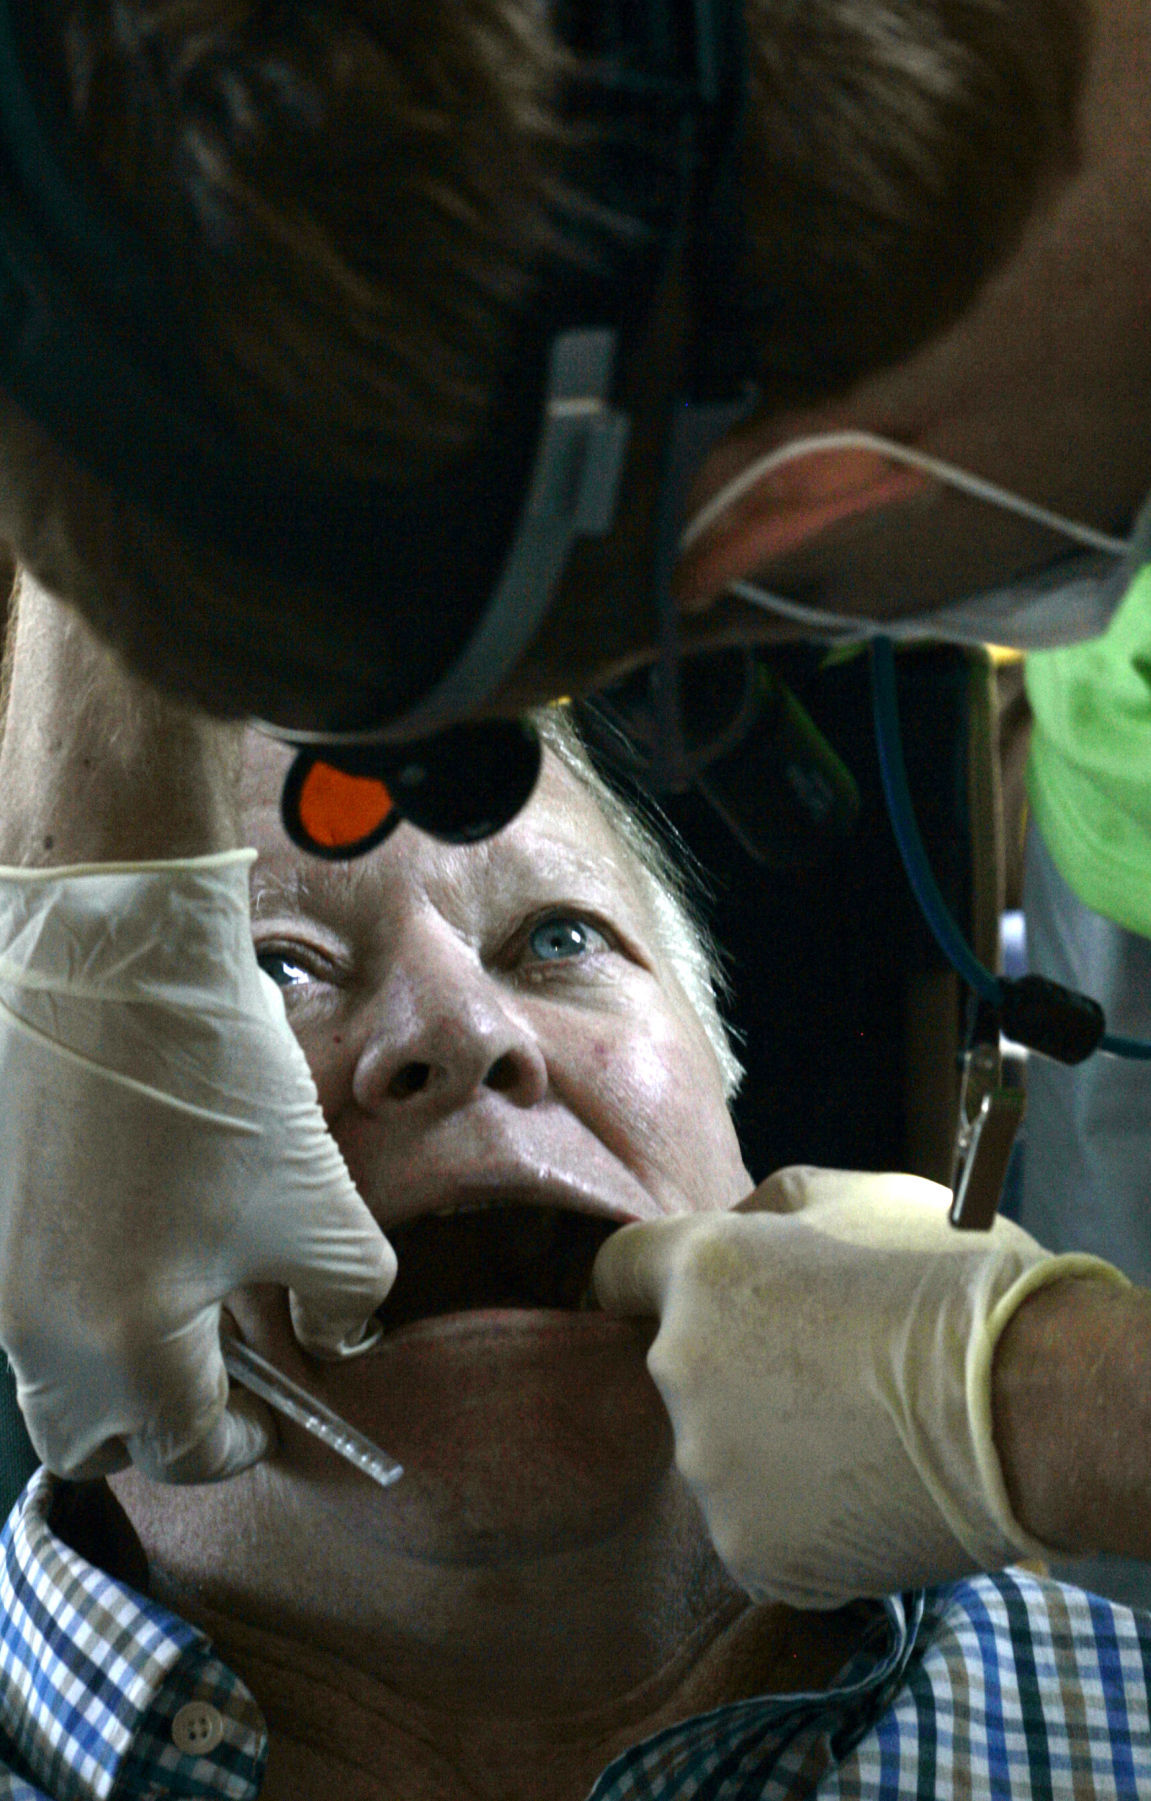 Dentists skip Hope Fest, seek better way to meet Tucson's 'astronomical' need